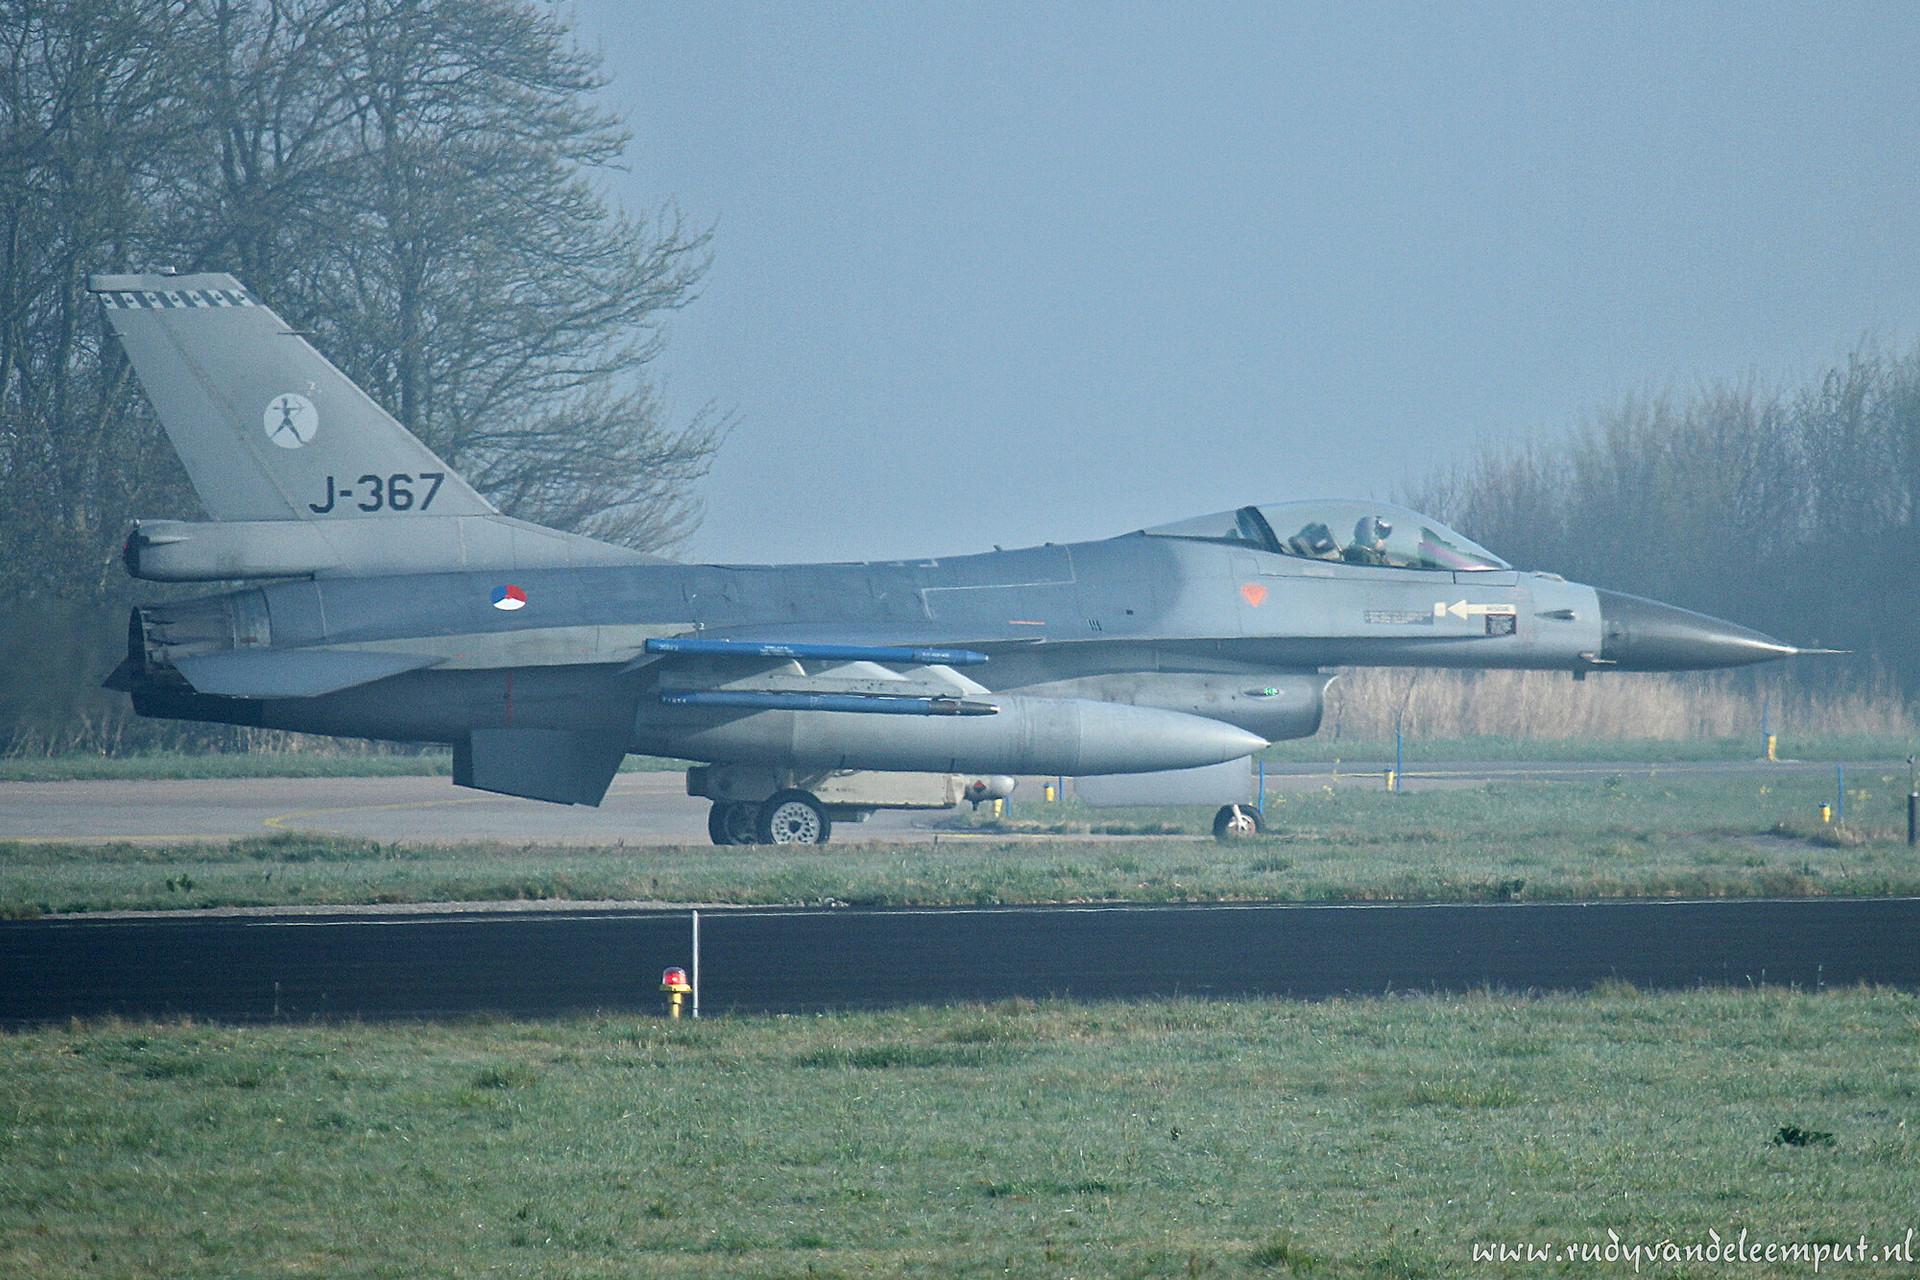 J-367   Build: 1987 - General Dynamics F-16 A Fighting Falcon